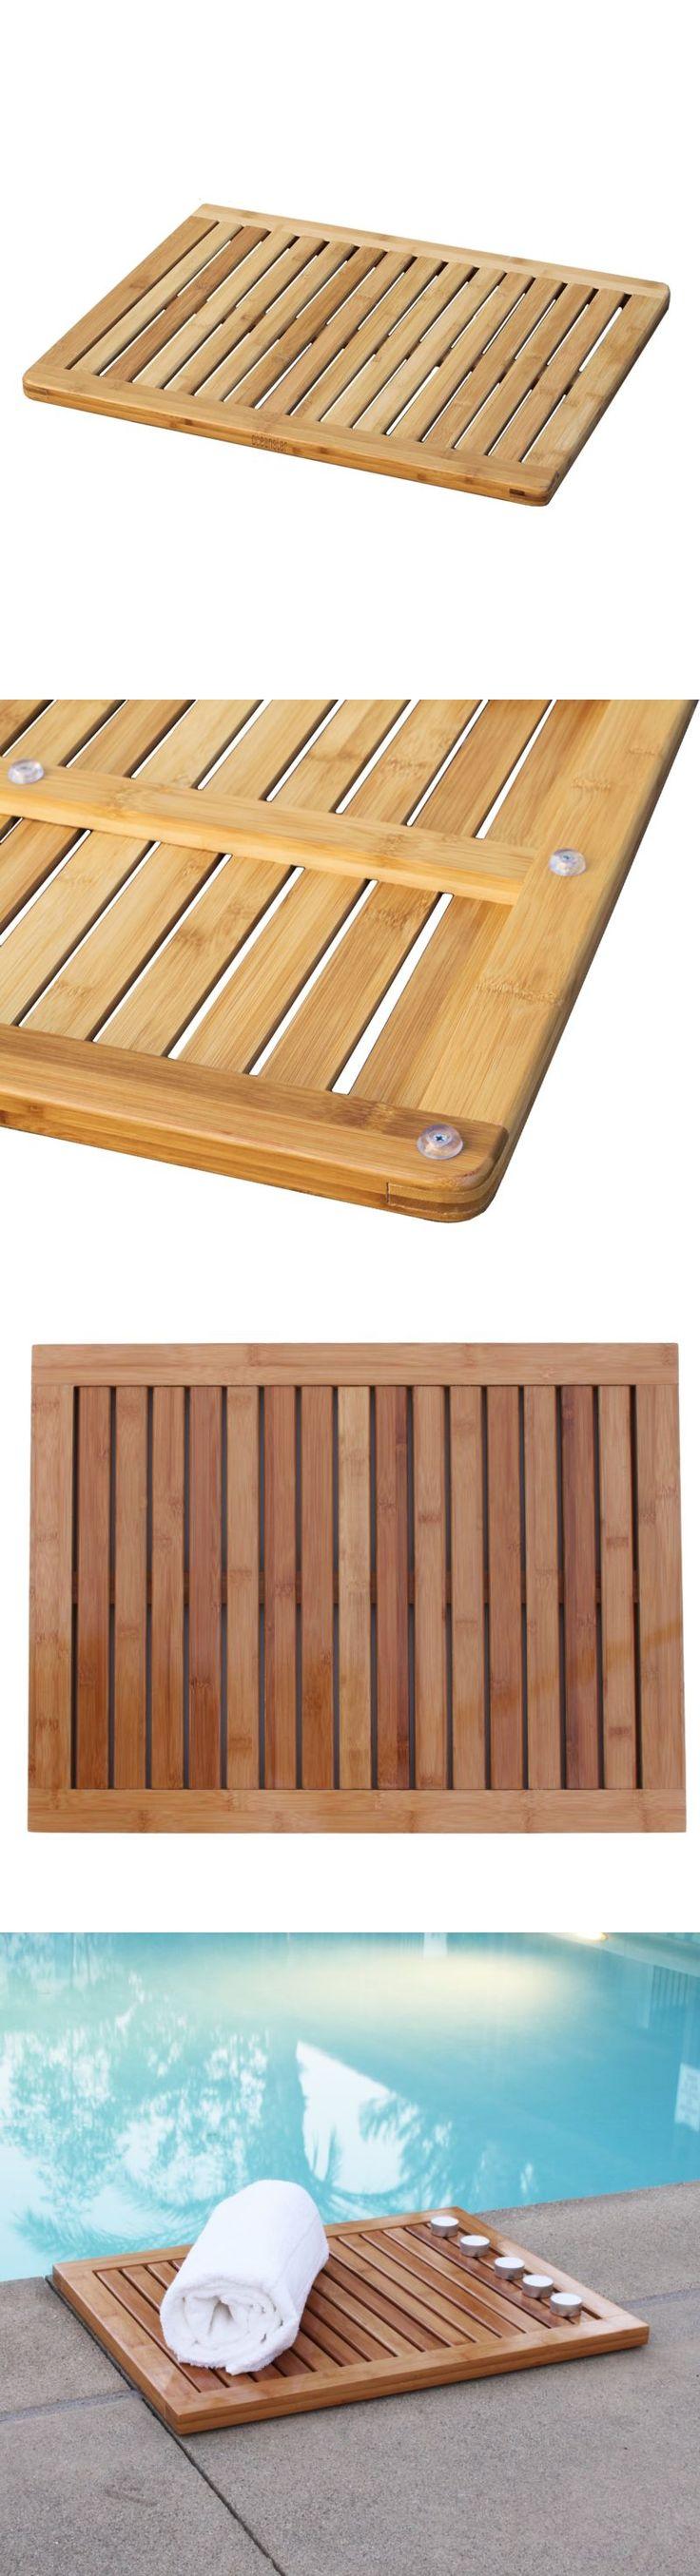 Maestro bath slide front page - Non Slip Appliques And Mats 66722 Bamboo Mat Shower Floor Wooden Bath Non Slip